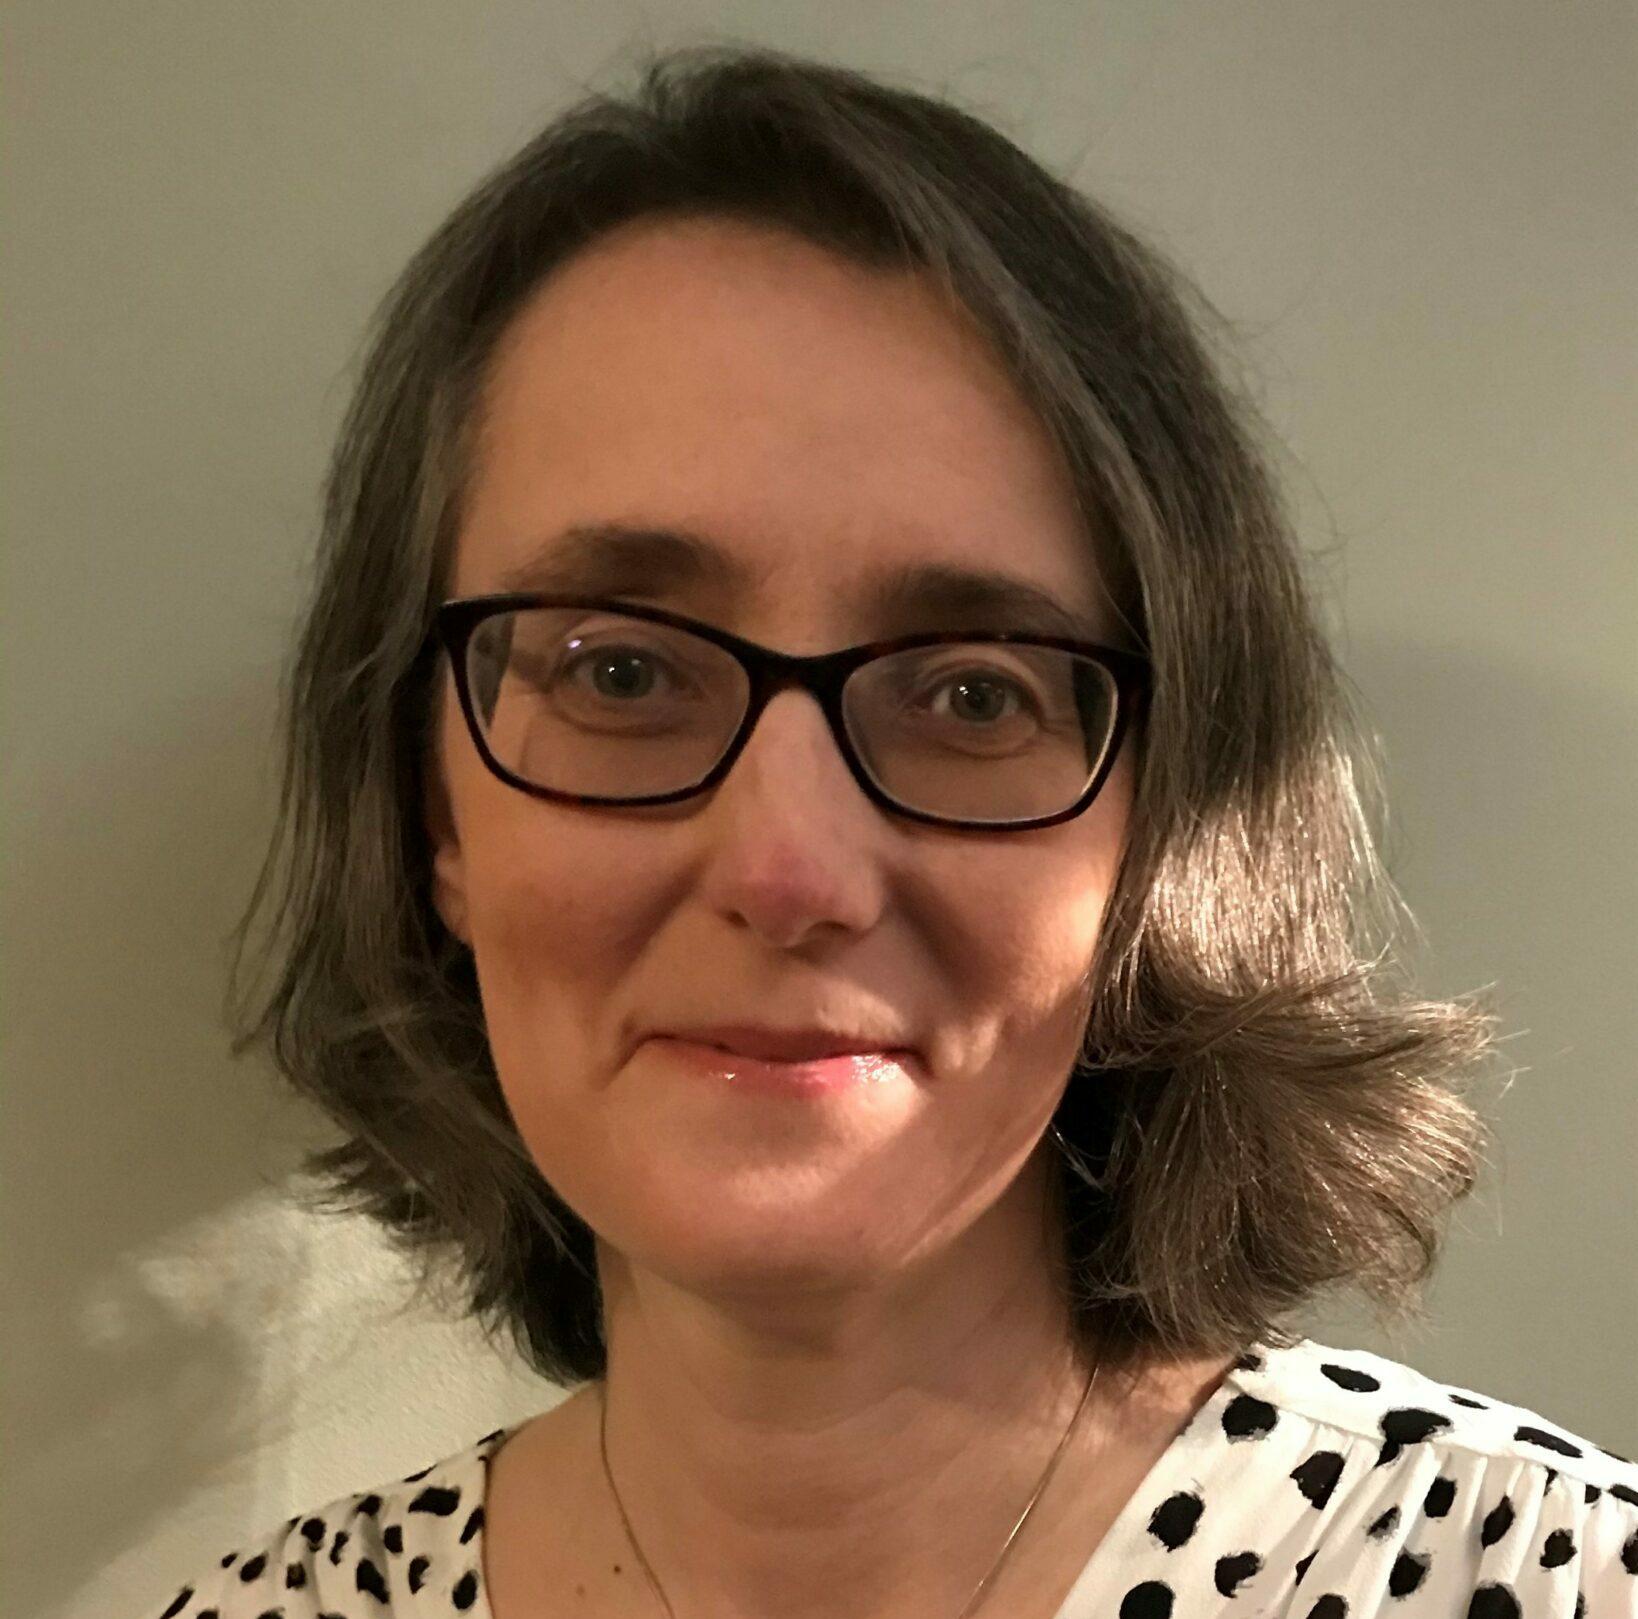 Zena Powell - profile image